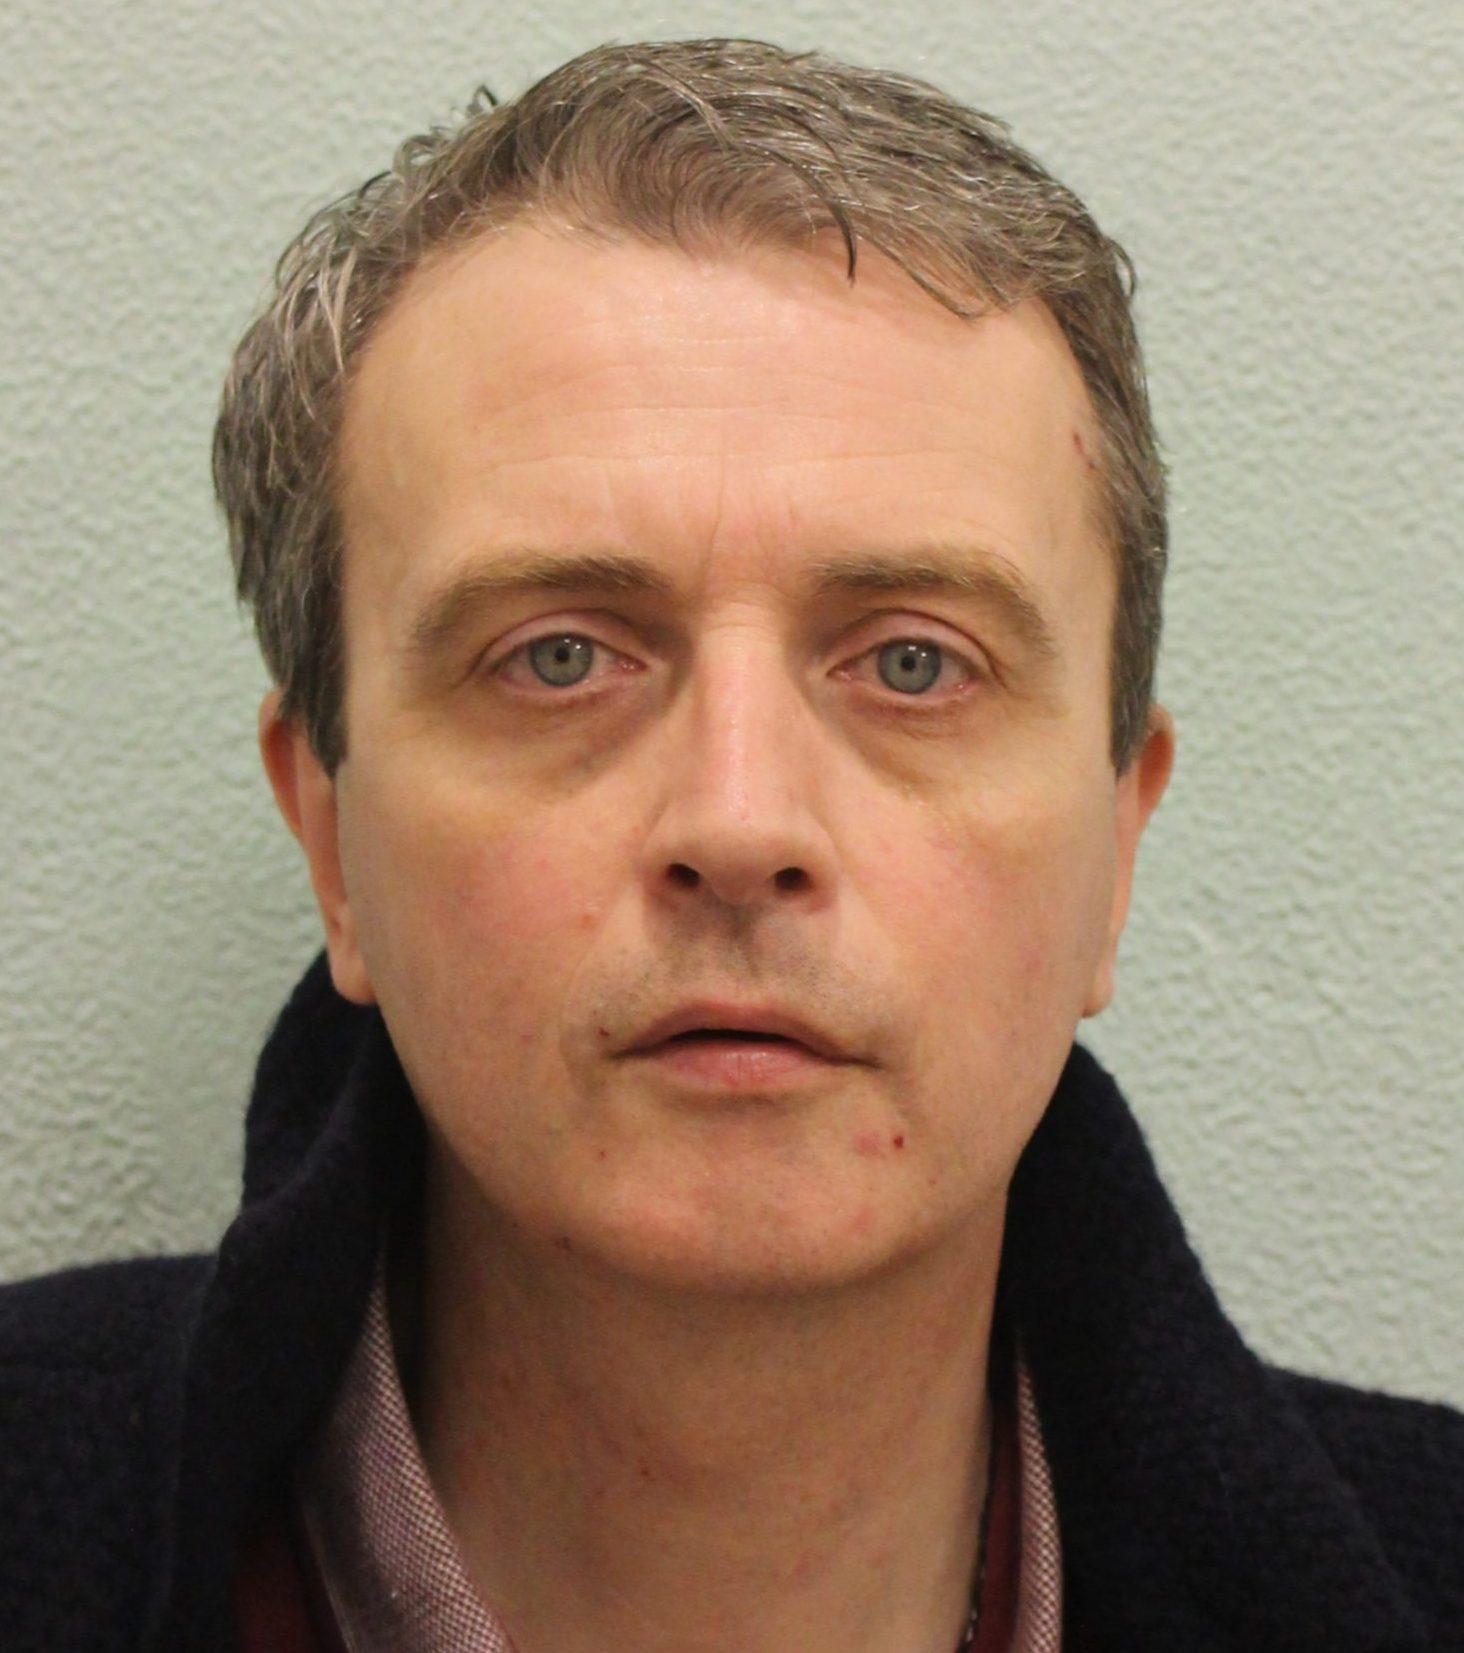 Paedophile killer faces a life sentence